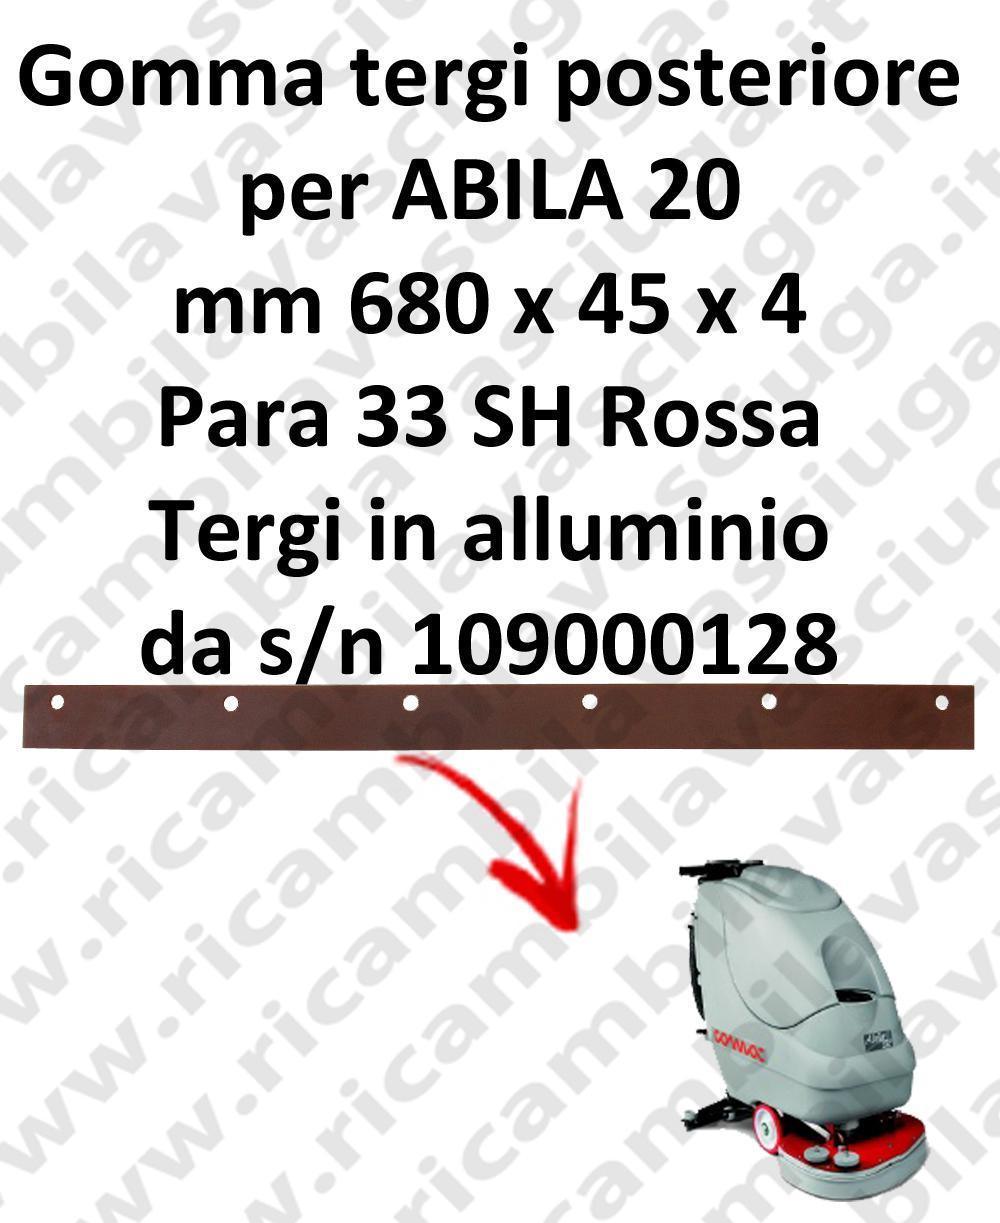 ABILA 20 Hinten Aluminium-Rakel von s/n 109000128 sauglippen für scheuersaugmaschinen COMAC